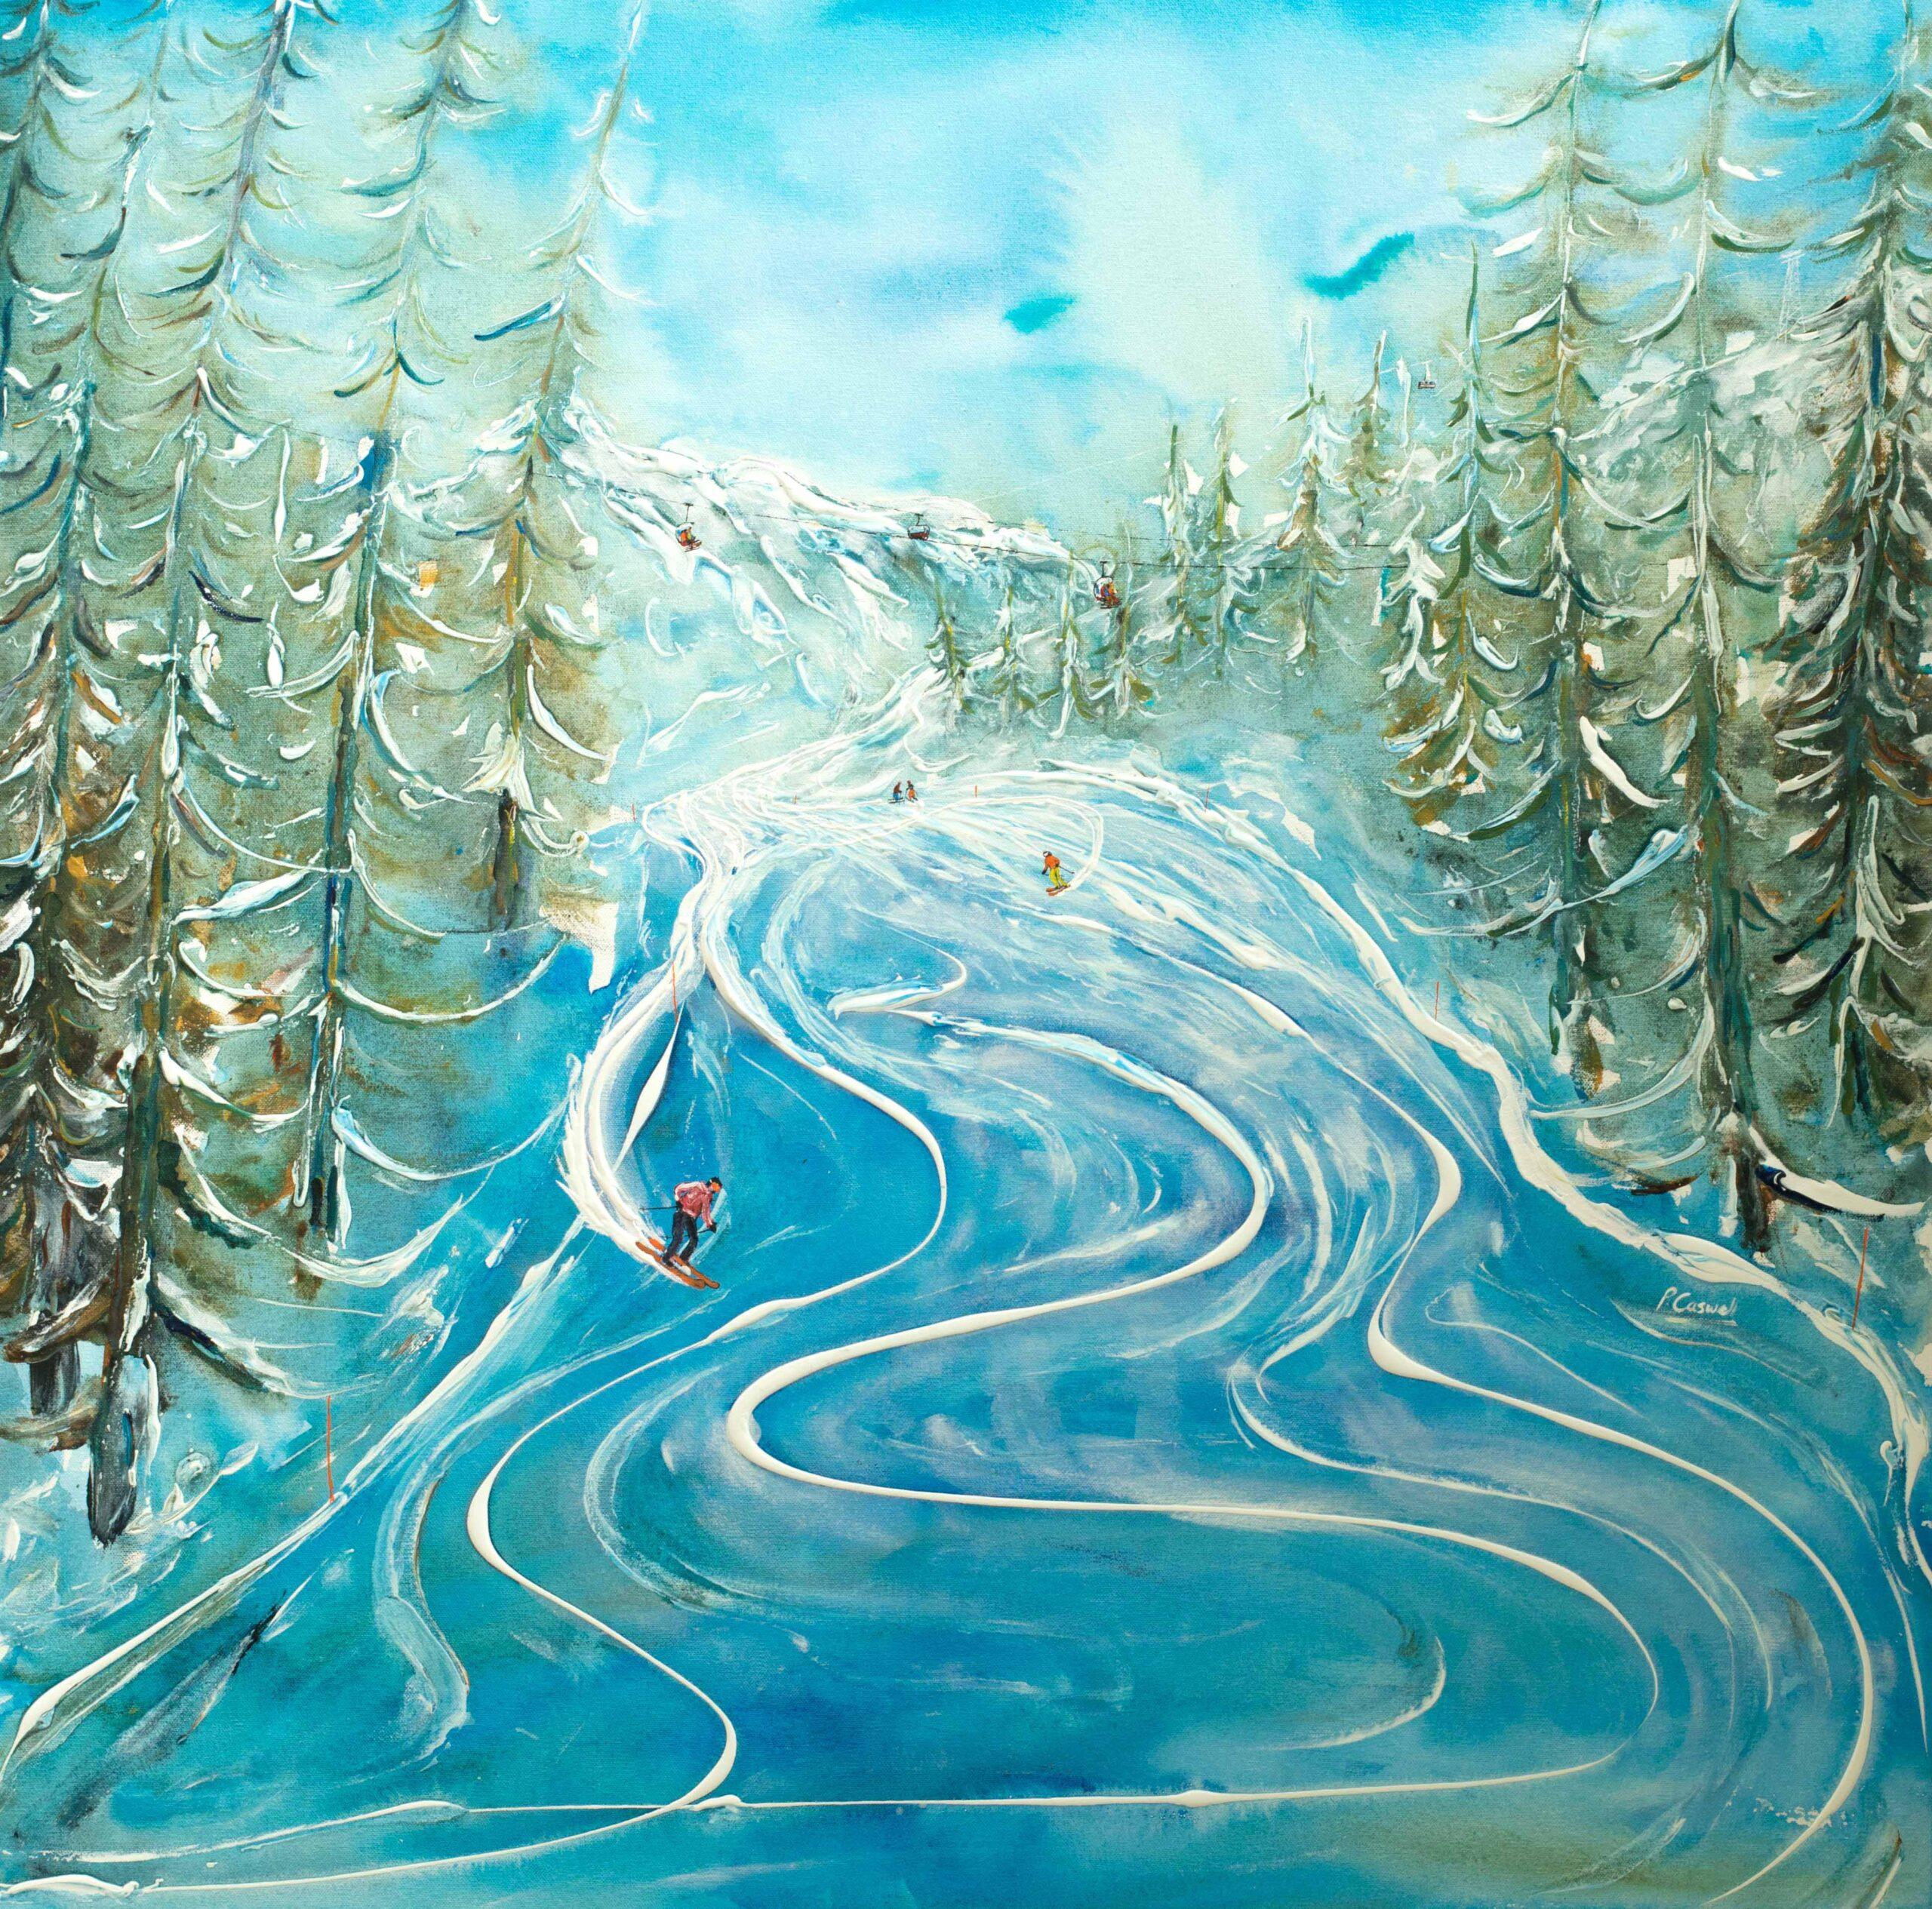 St Moritz Ski Painting Exhibition